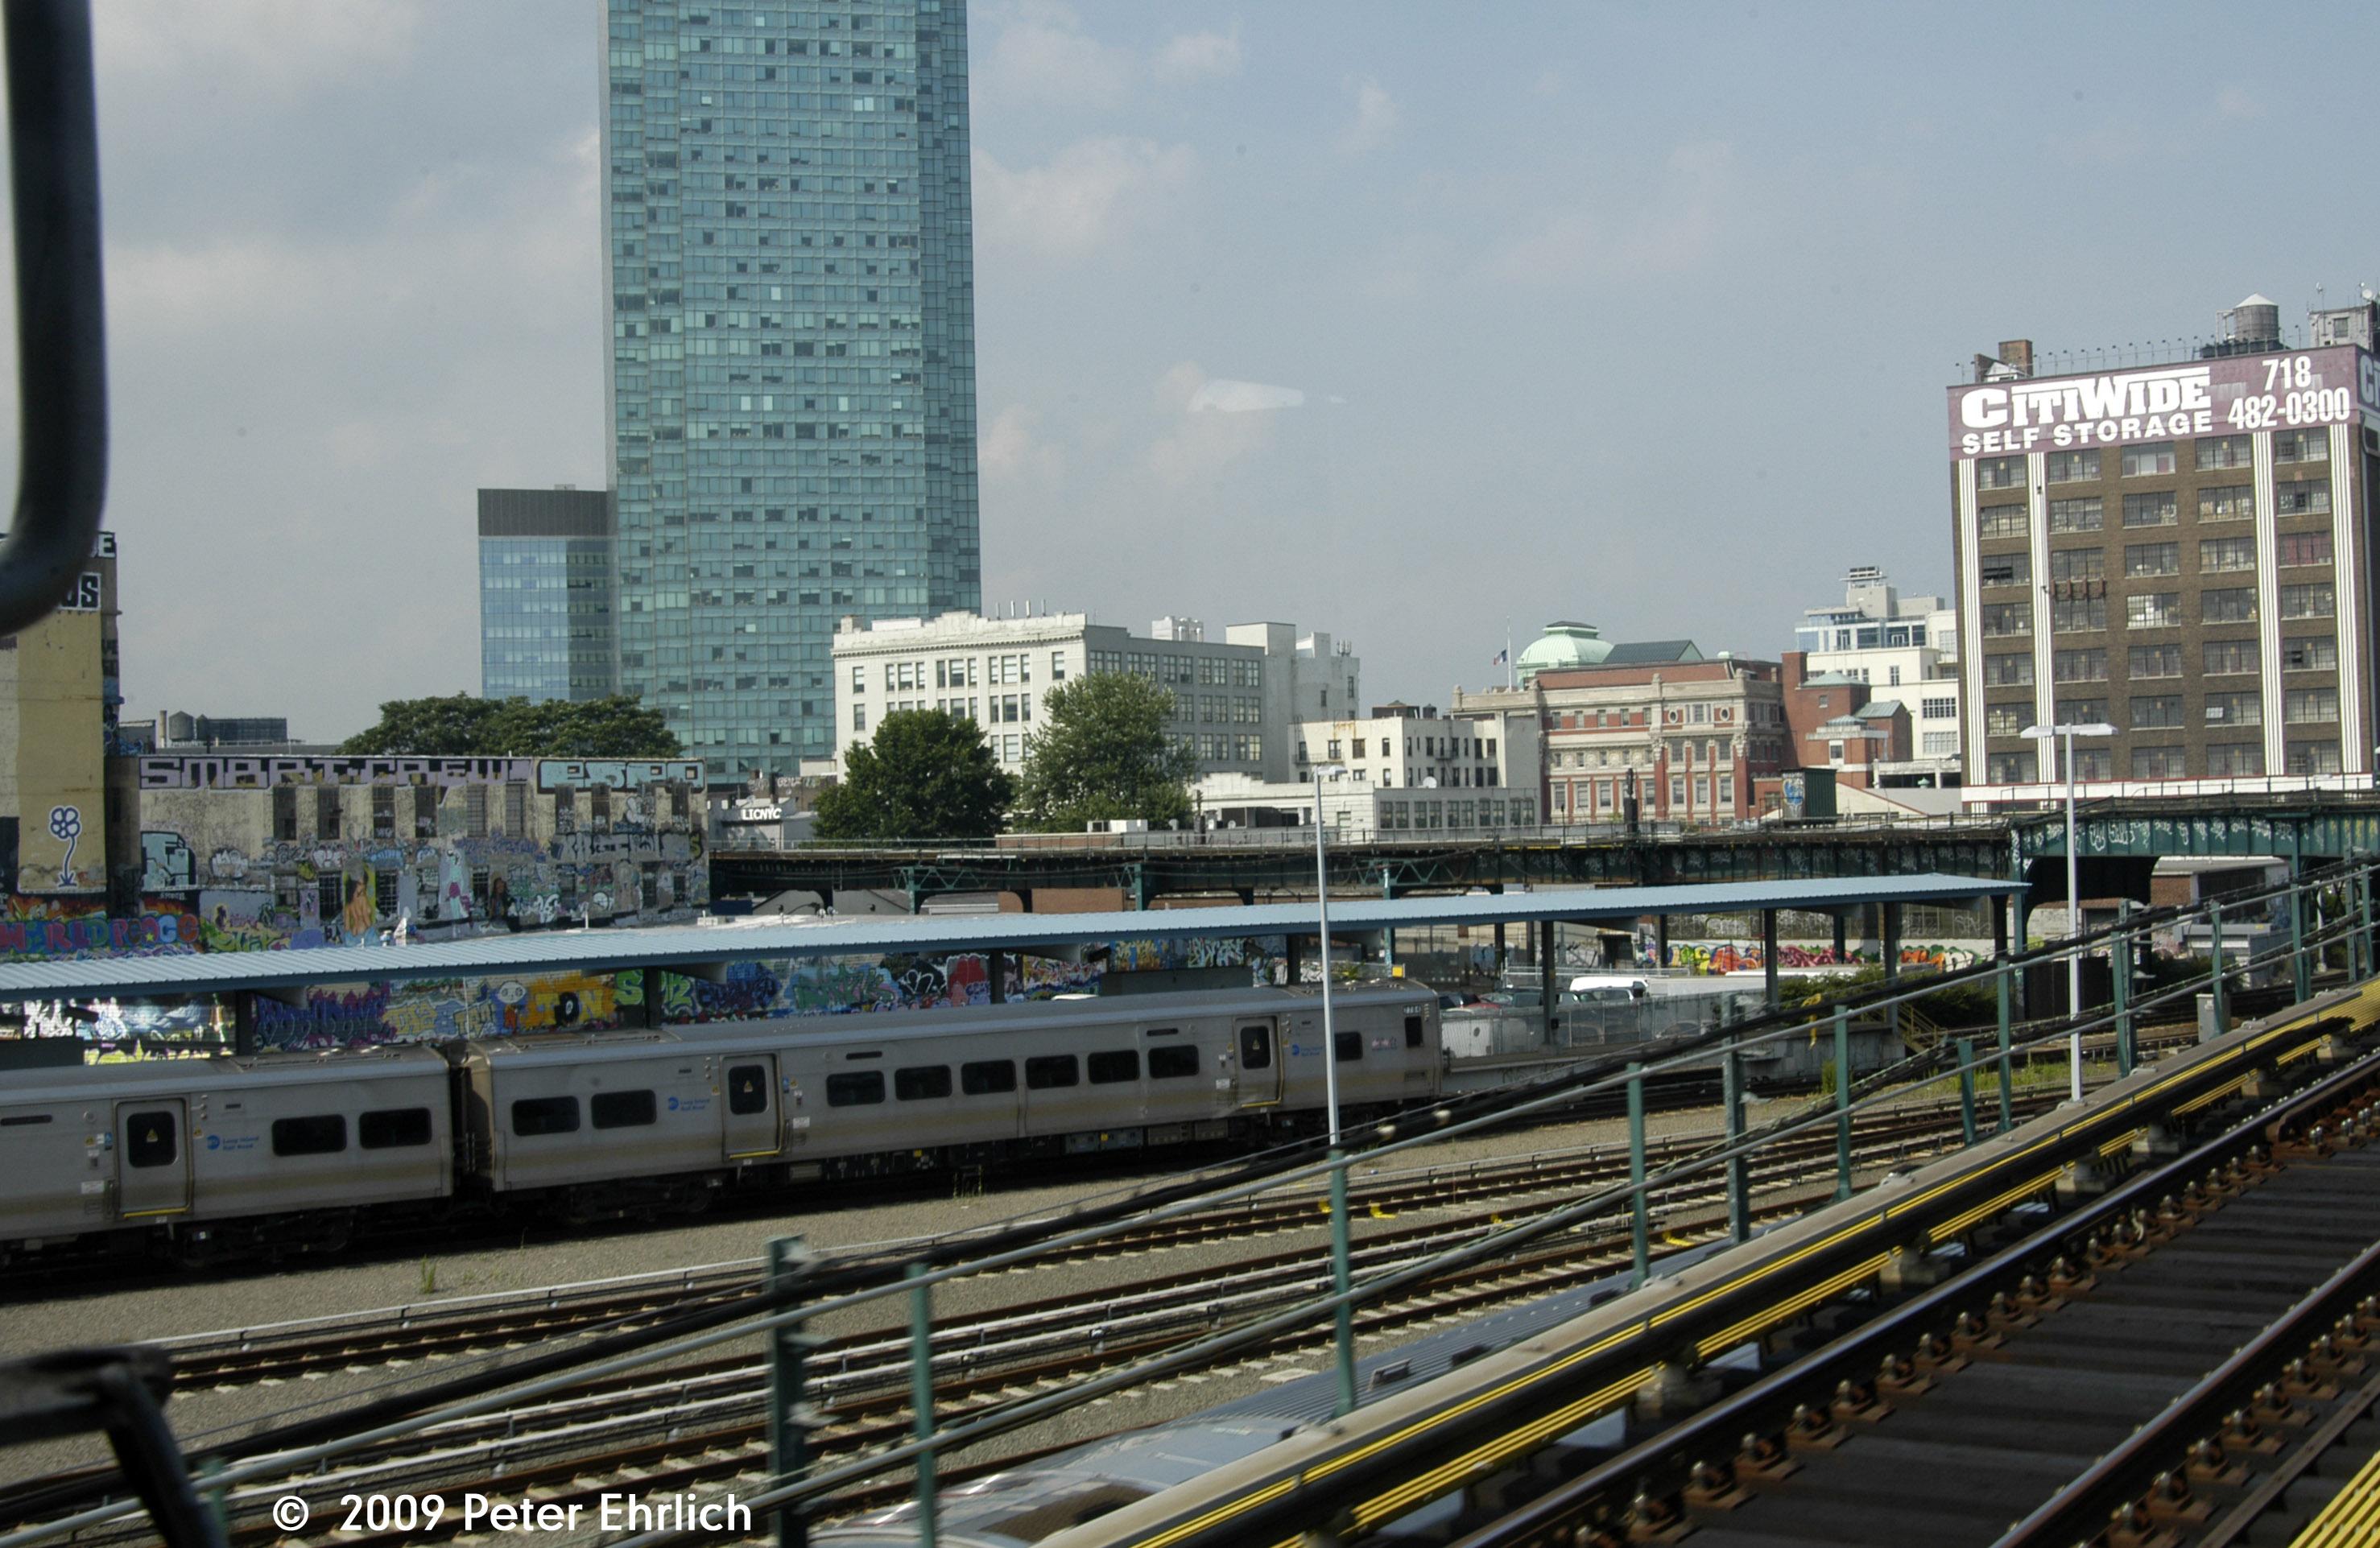 (958k, 2956x1923)<br><b>Country:</b> United States<br><b>City:</b> New York<br><b>System:</b> Long Island Rail Road<br><b>Line:</b> LIRR Main Line<br><b>Location:</b> Hunterspoint Avenue<br><b>Car:</b> LIRR M-7 EMU (Bombardier) 7254 <br><b>Photo by:</b> Peter Ehrlich<br><b>Date:</b> 7/22/2009<br><b>Viewed (this week/total):</b> 1 / 848